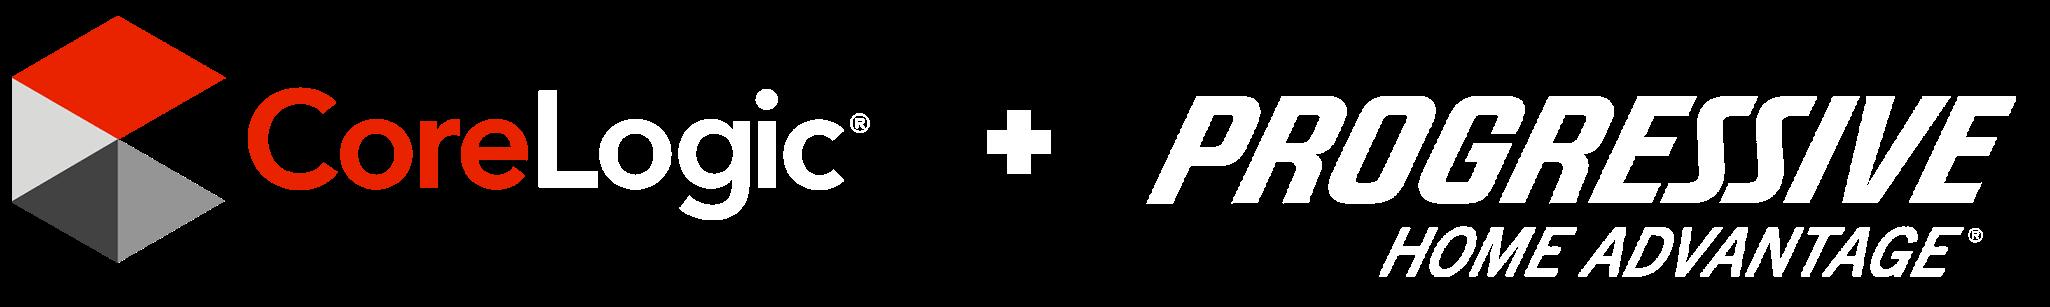 Logos: CoreLogic + Progressive Home Advantage